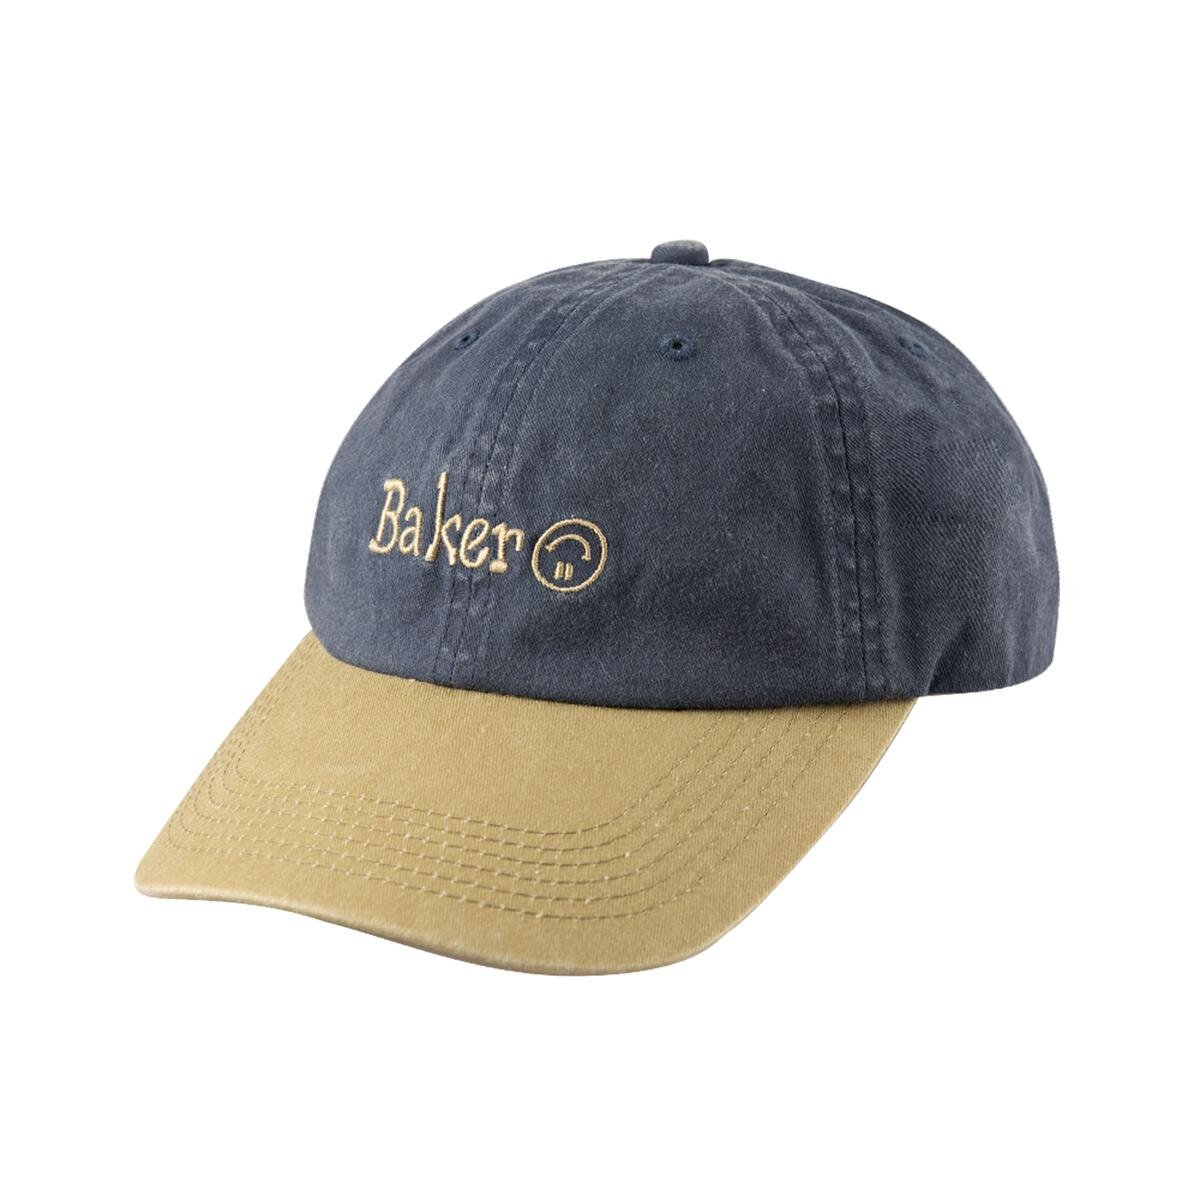 Baker Upside Snapback hat navy